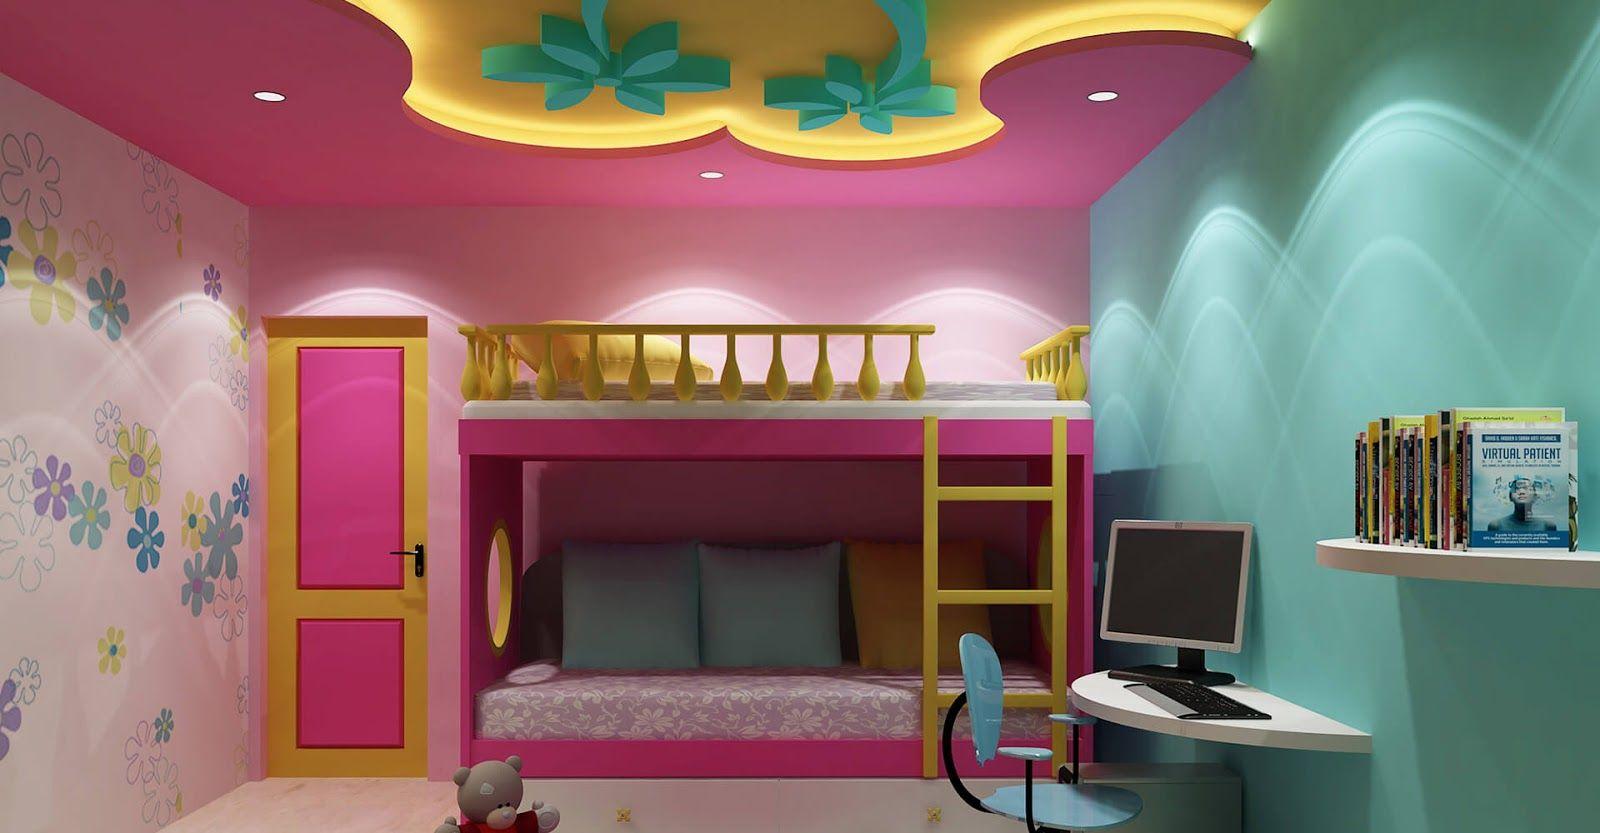 ديكور جبس بورد غرف نوم 2020 17